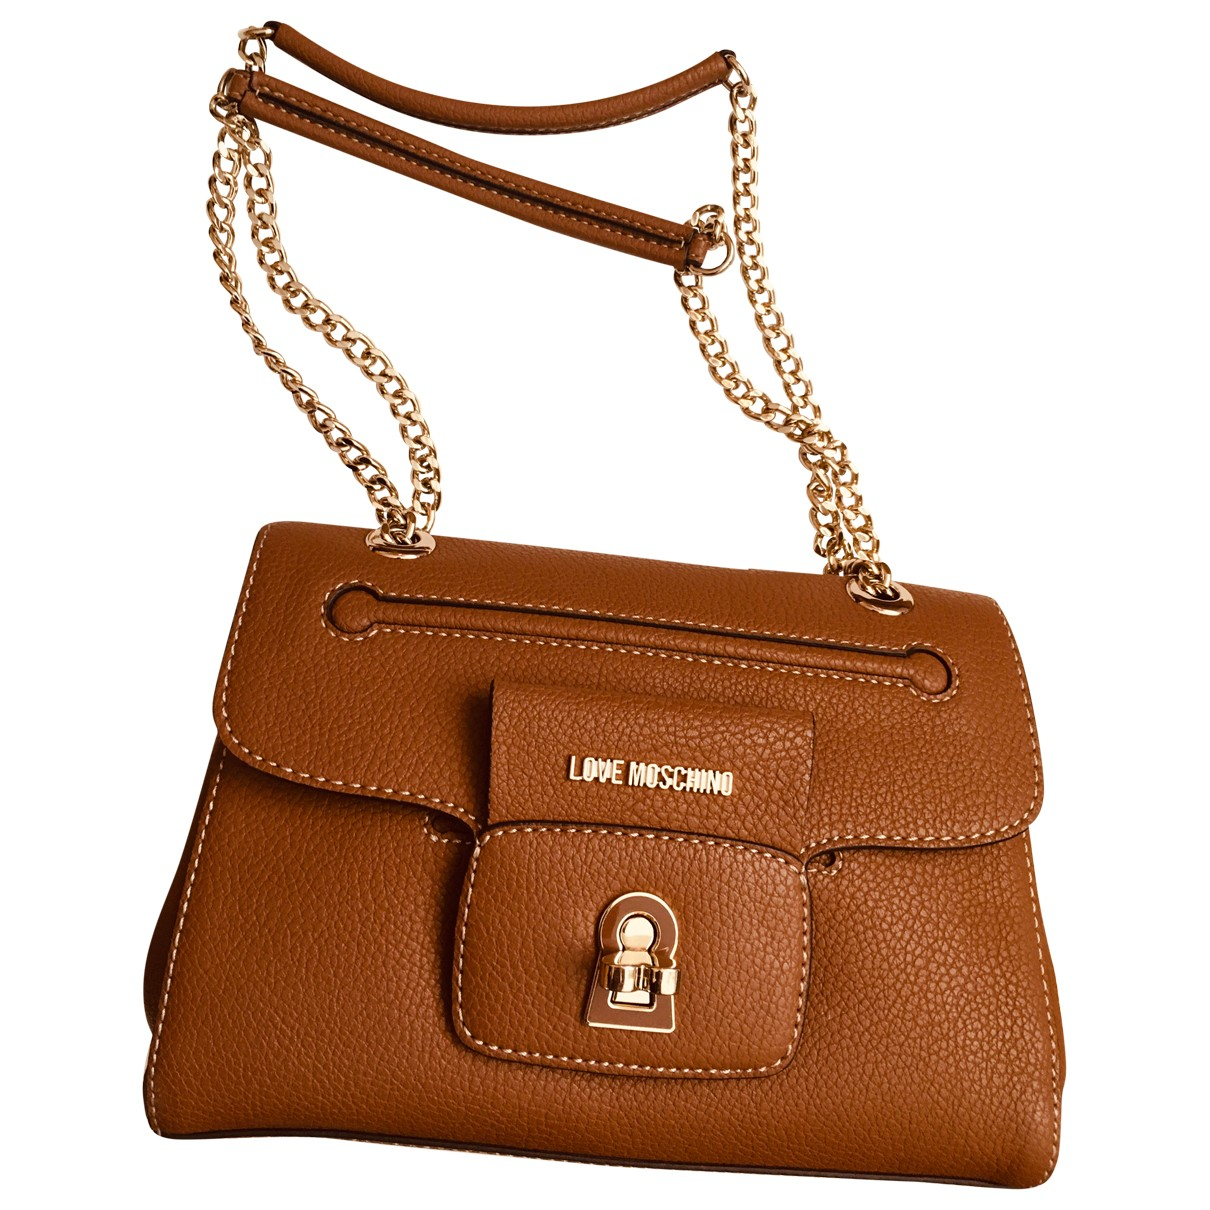 Moschino Love N Brown Faux fur handbag for Women N